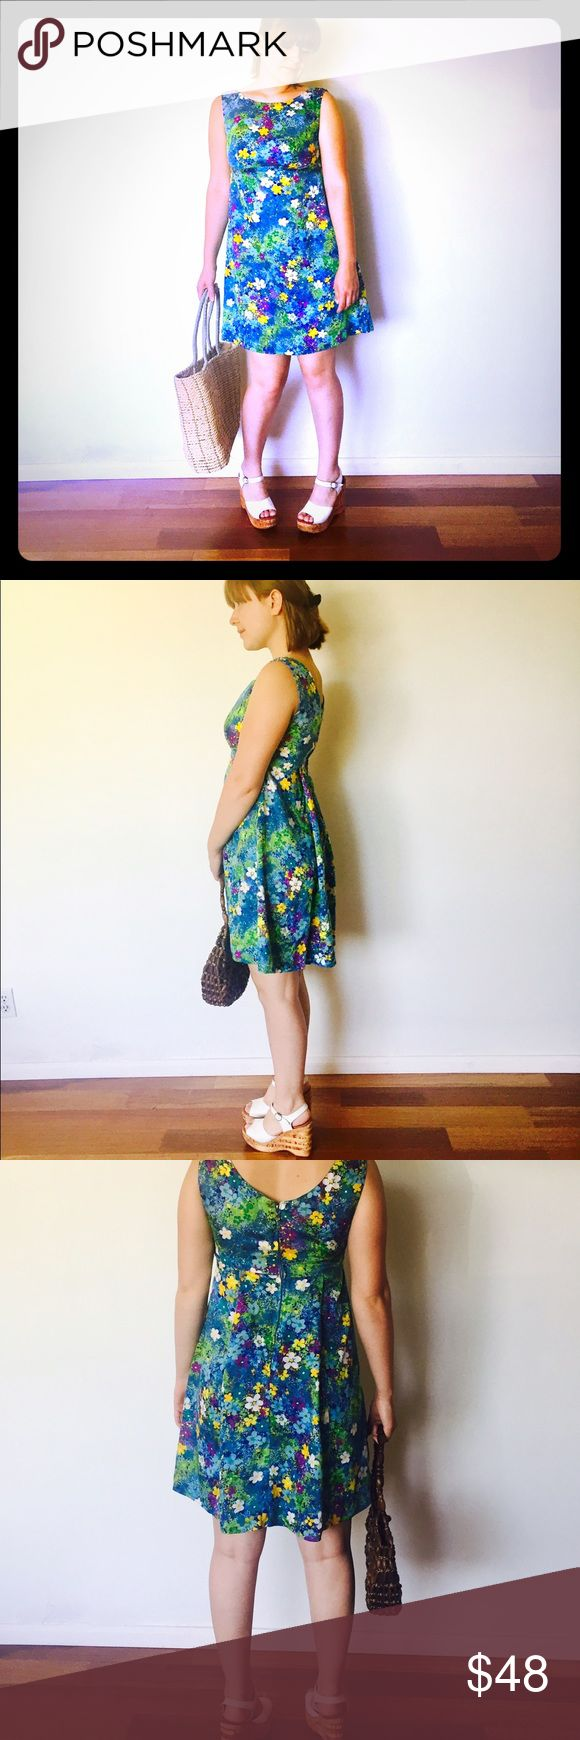 60s Hawaiian Mini Dress M 6 7 Pineapple Princess Vintage 60s Hawaiian empire waist dress with a big floral print.  It zips up the back with a nylon zipper.    Material: cotton blend Maker: Where: Hawaii Era: 60's  Size: M 6/7 Vintage Dresses Mini